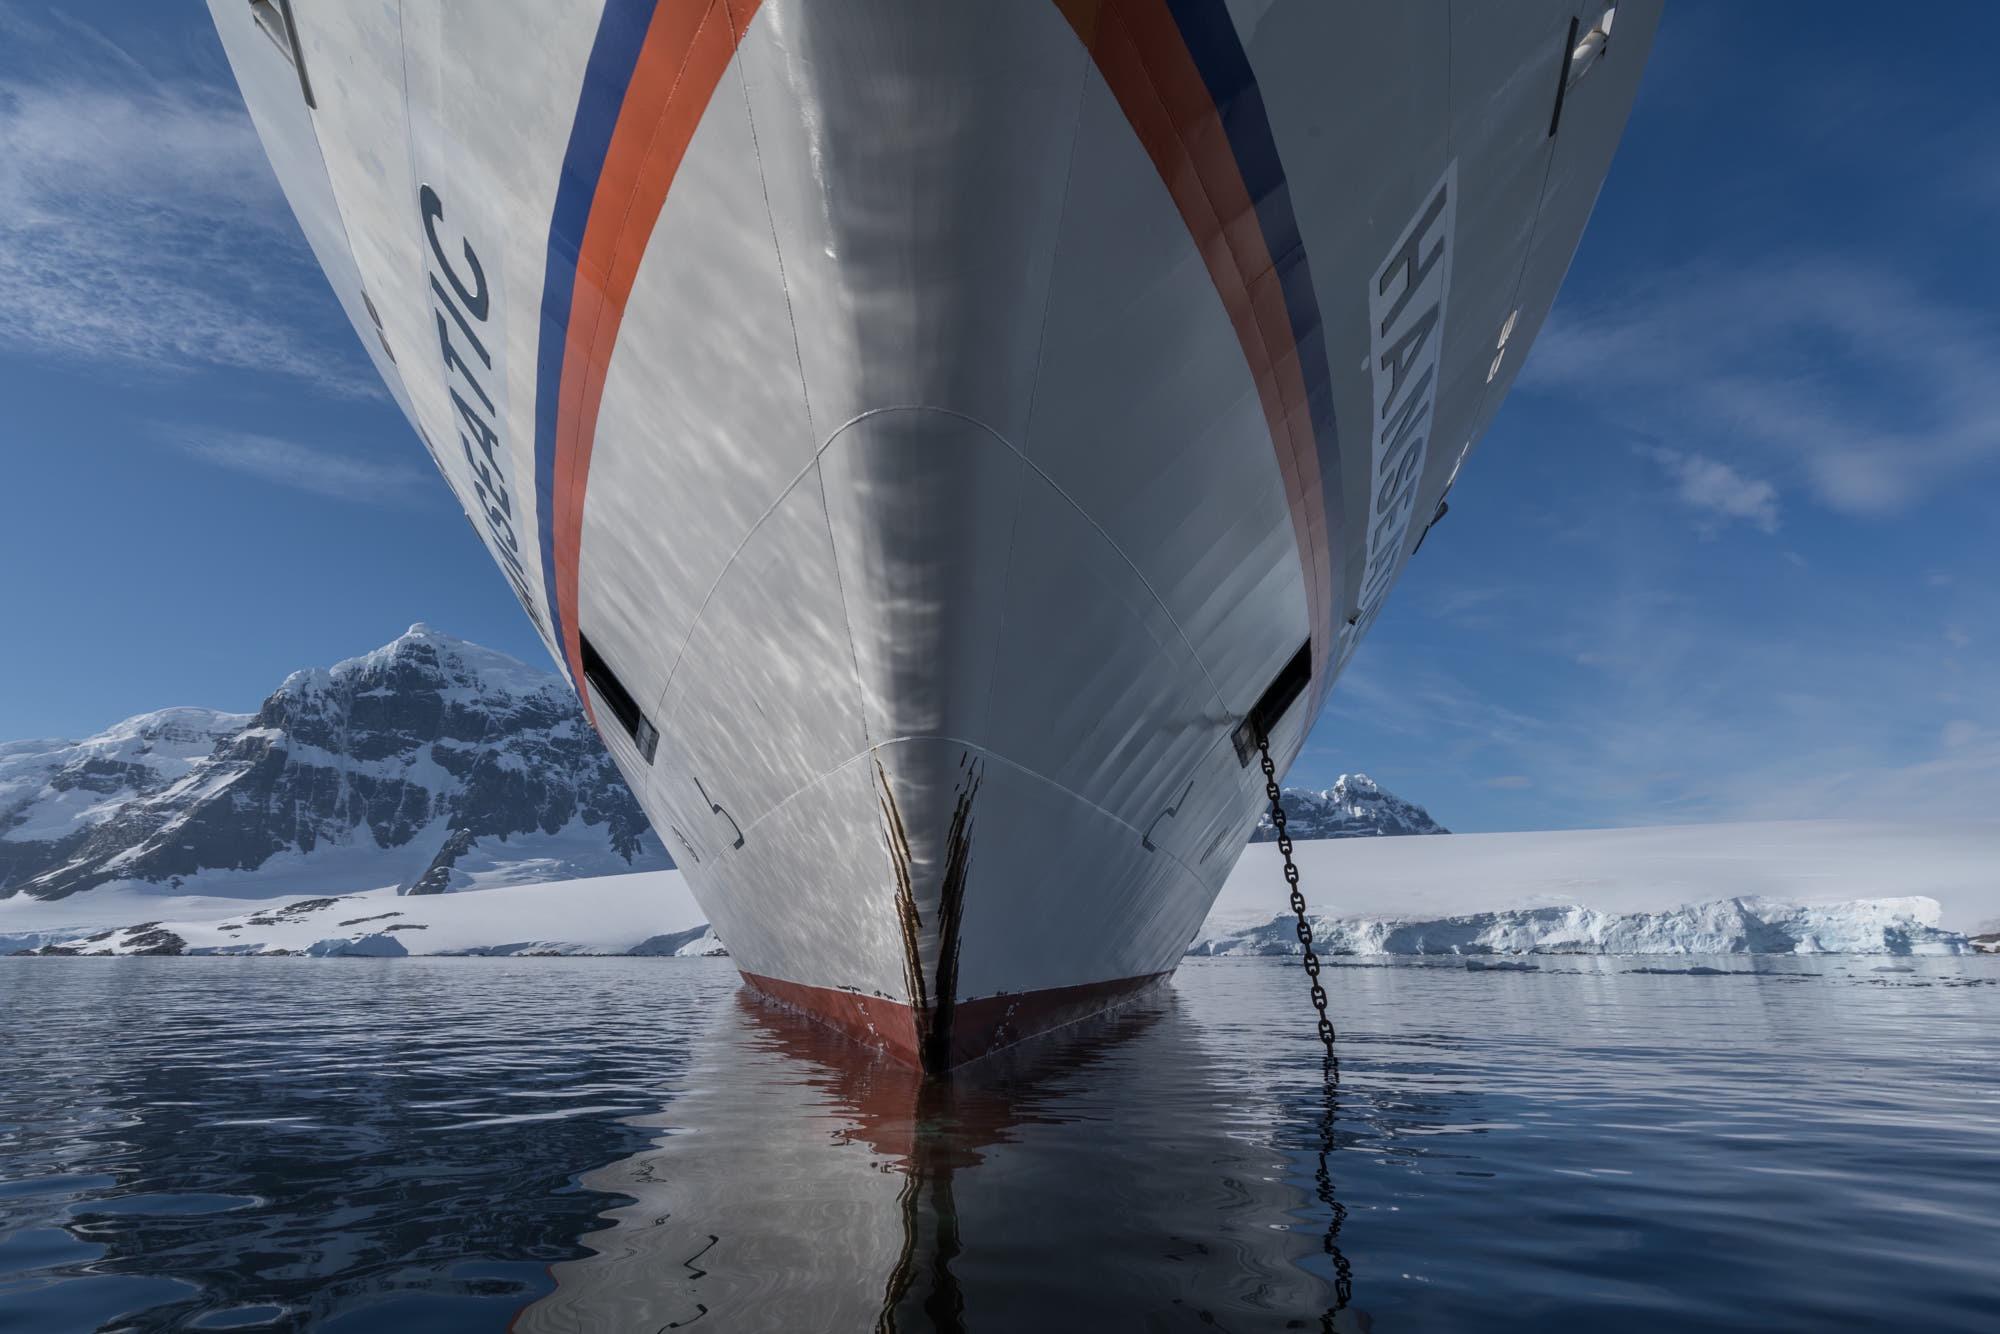 MV Hanseatic